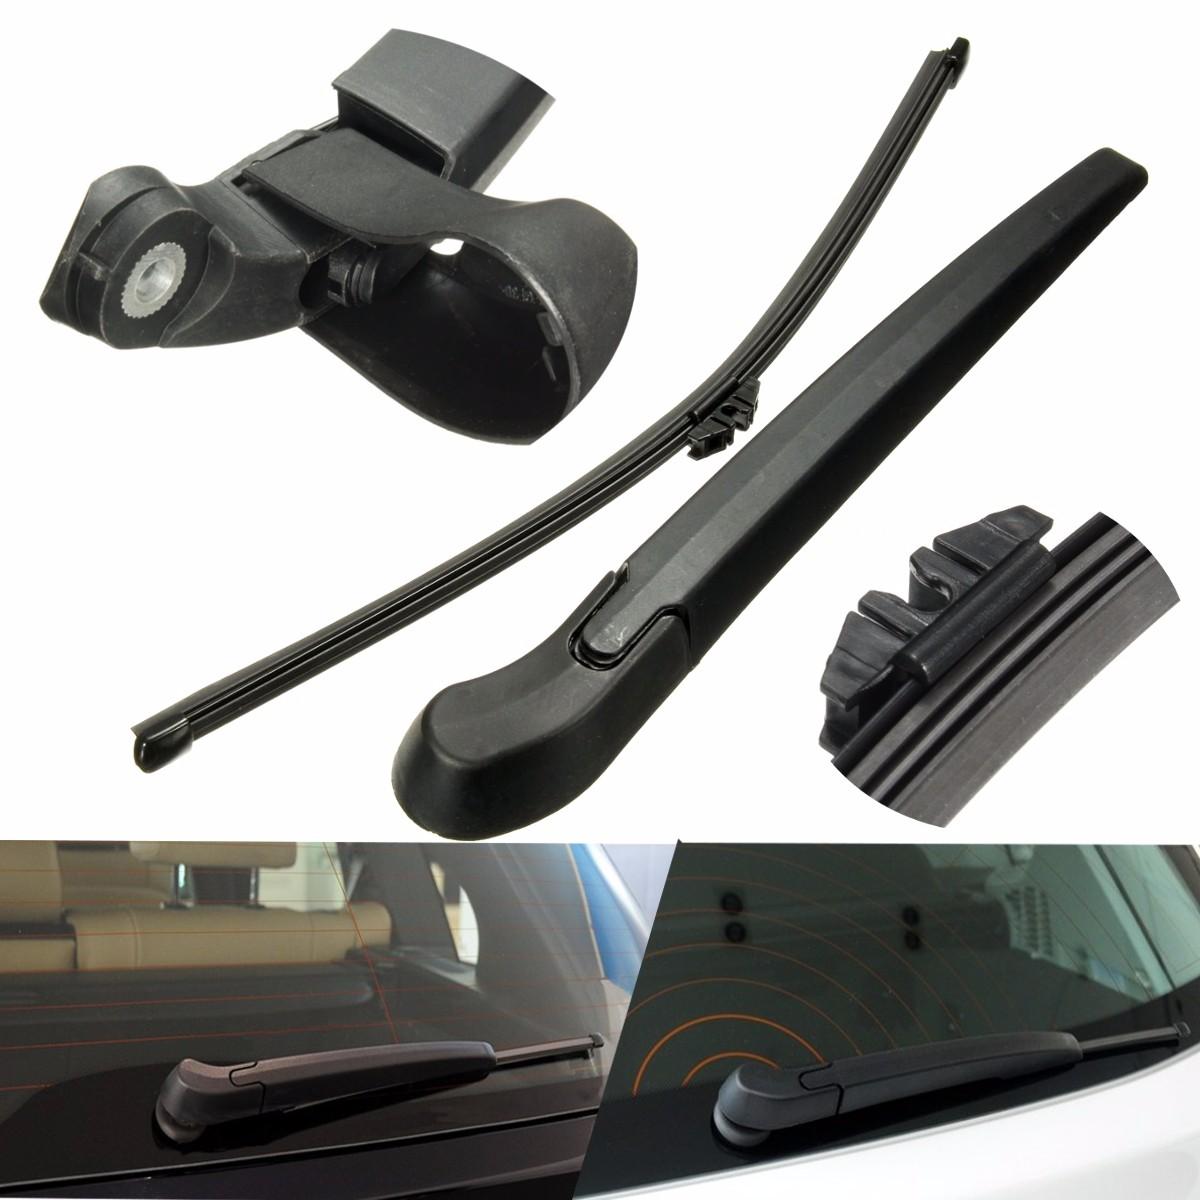 Car Rear Window Windshield Wiper Arm&Blade Plastic Replace For BMW (2007-2013) X5 /X5M /E70